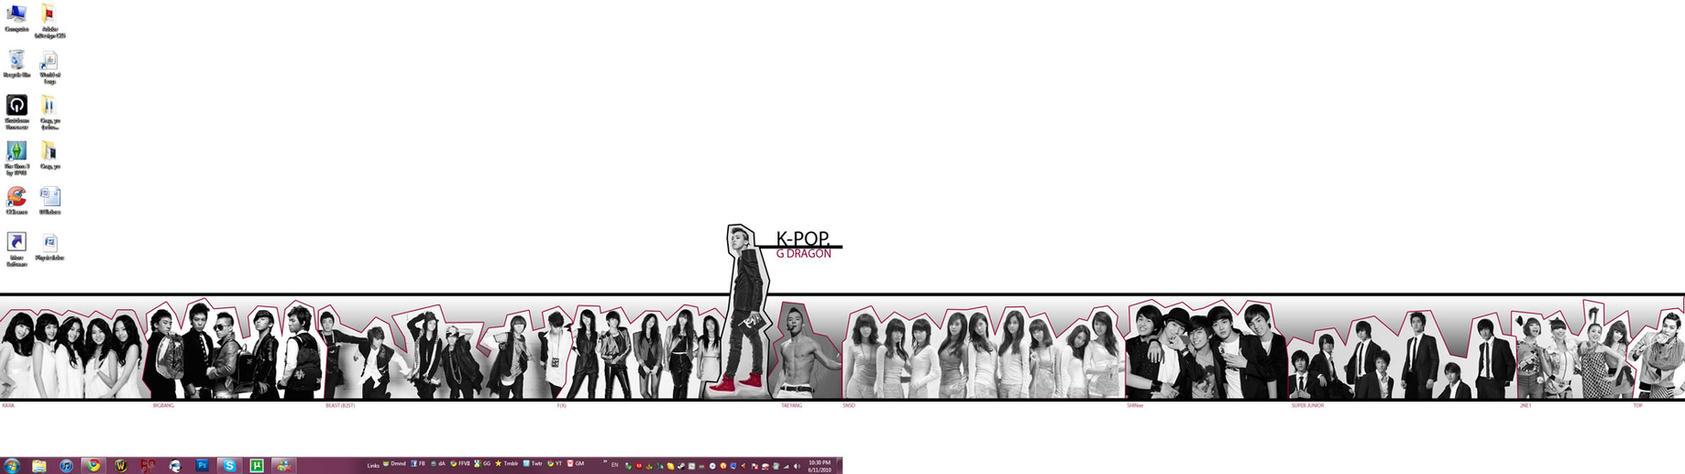 Desktop Screenie - 06.11.10 by hannarb